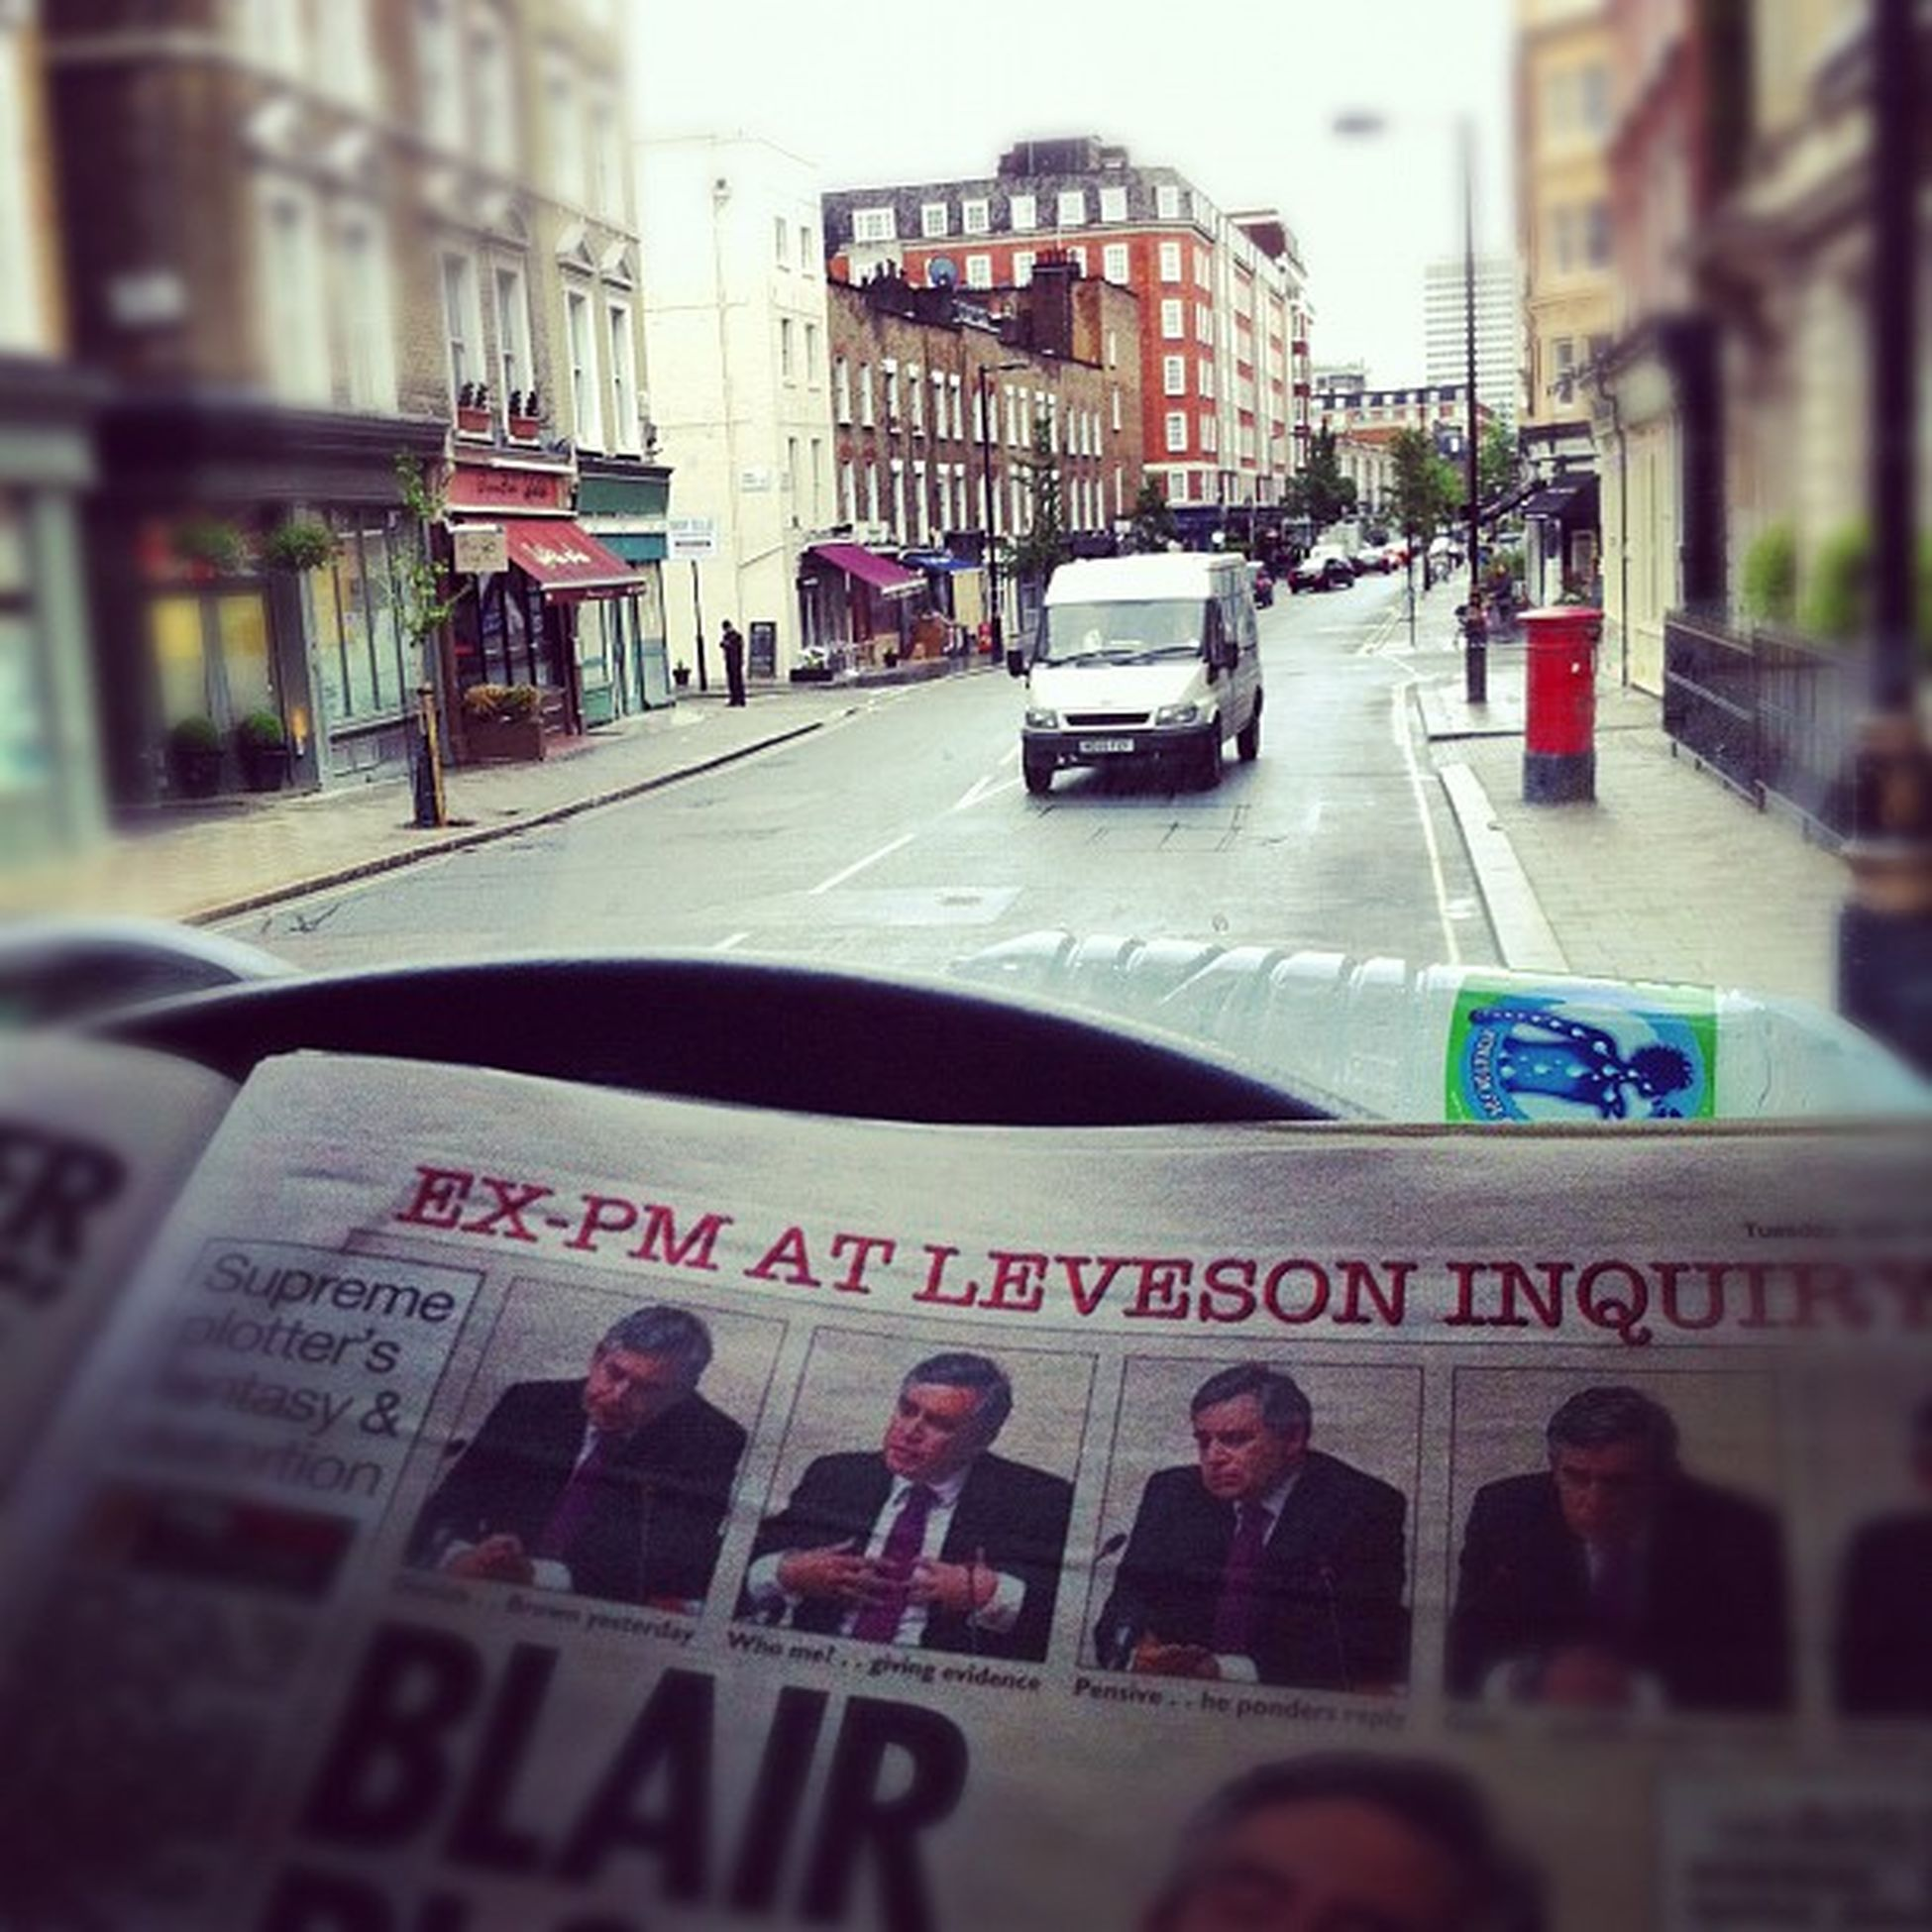 Uk Goingtogetaticket Busy Seymourplacelondon london worksucks cab bored daf cool